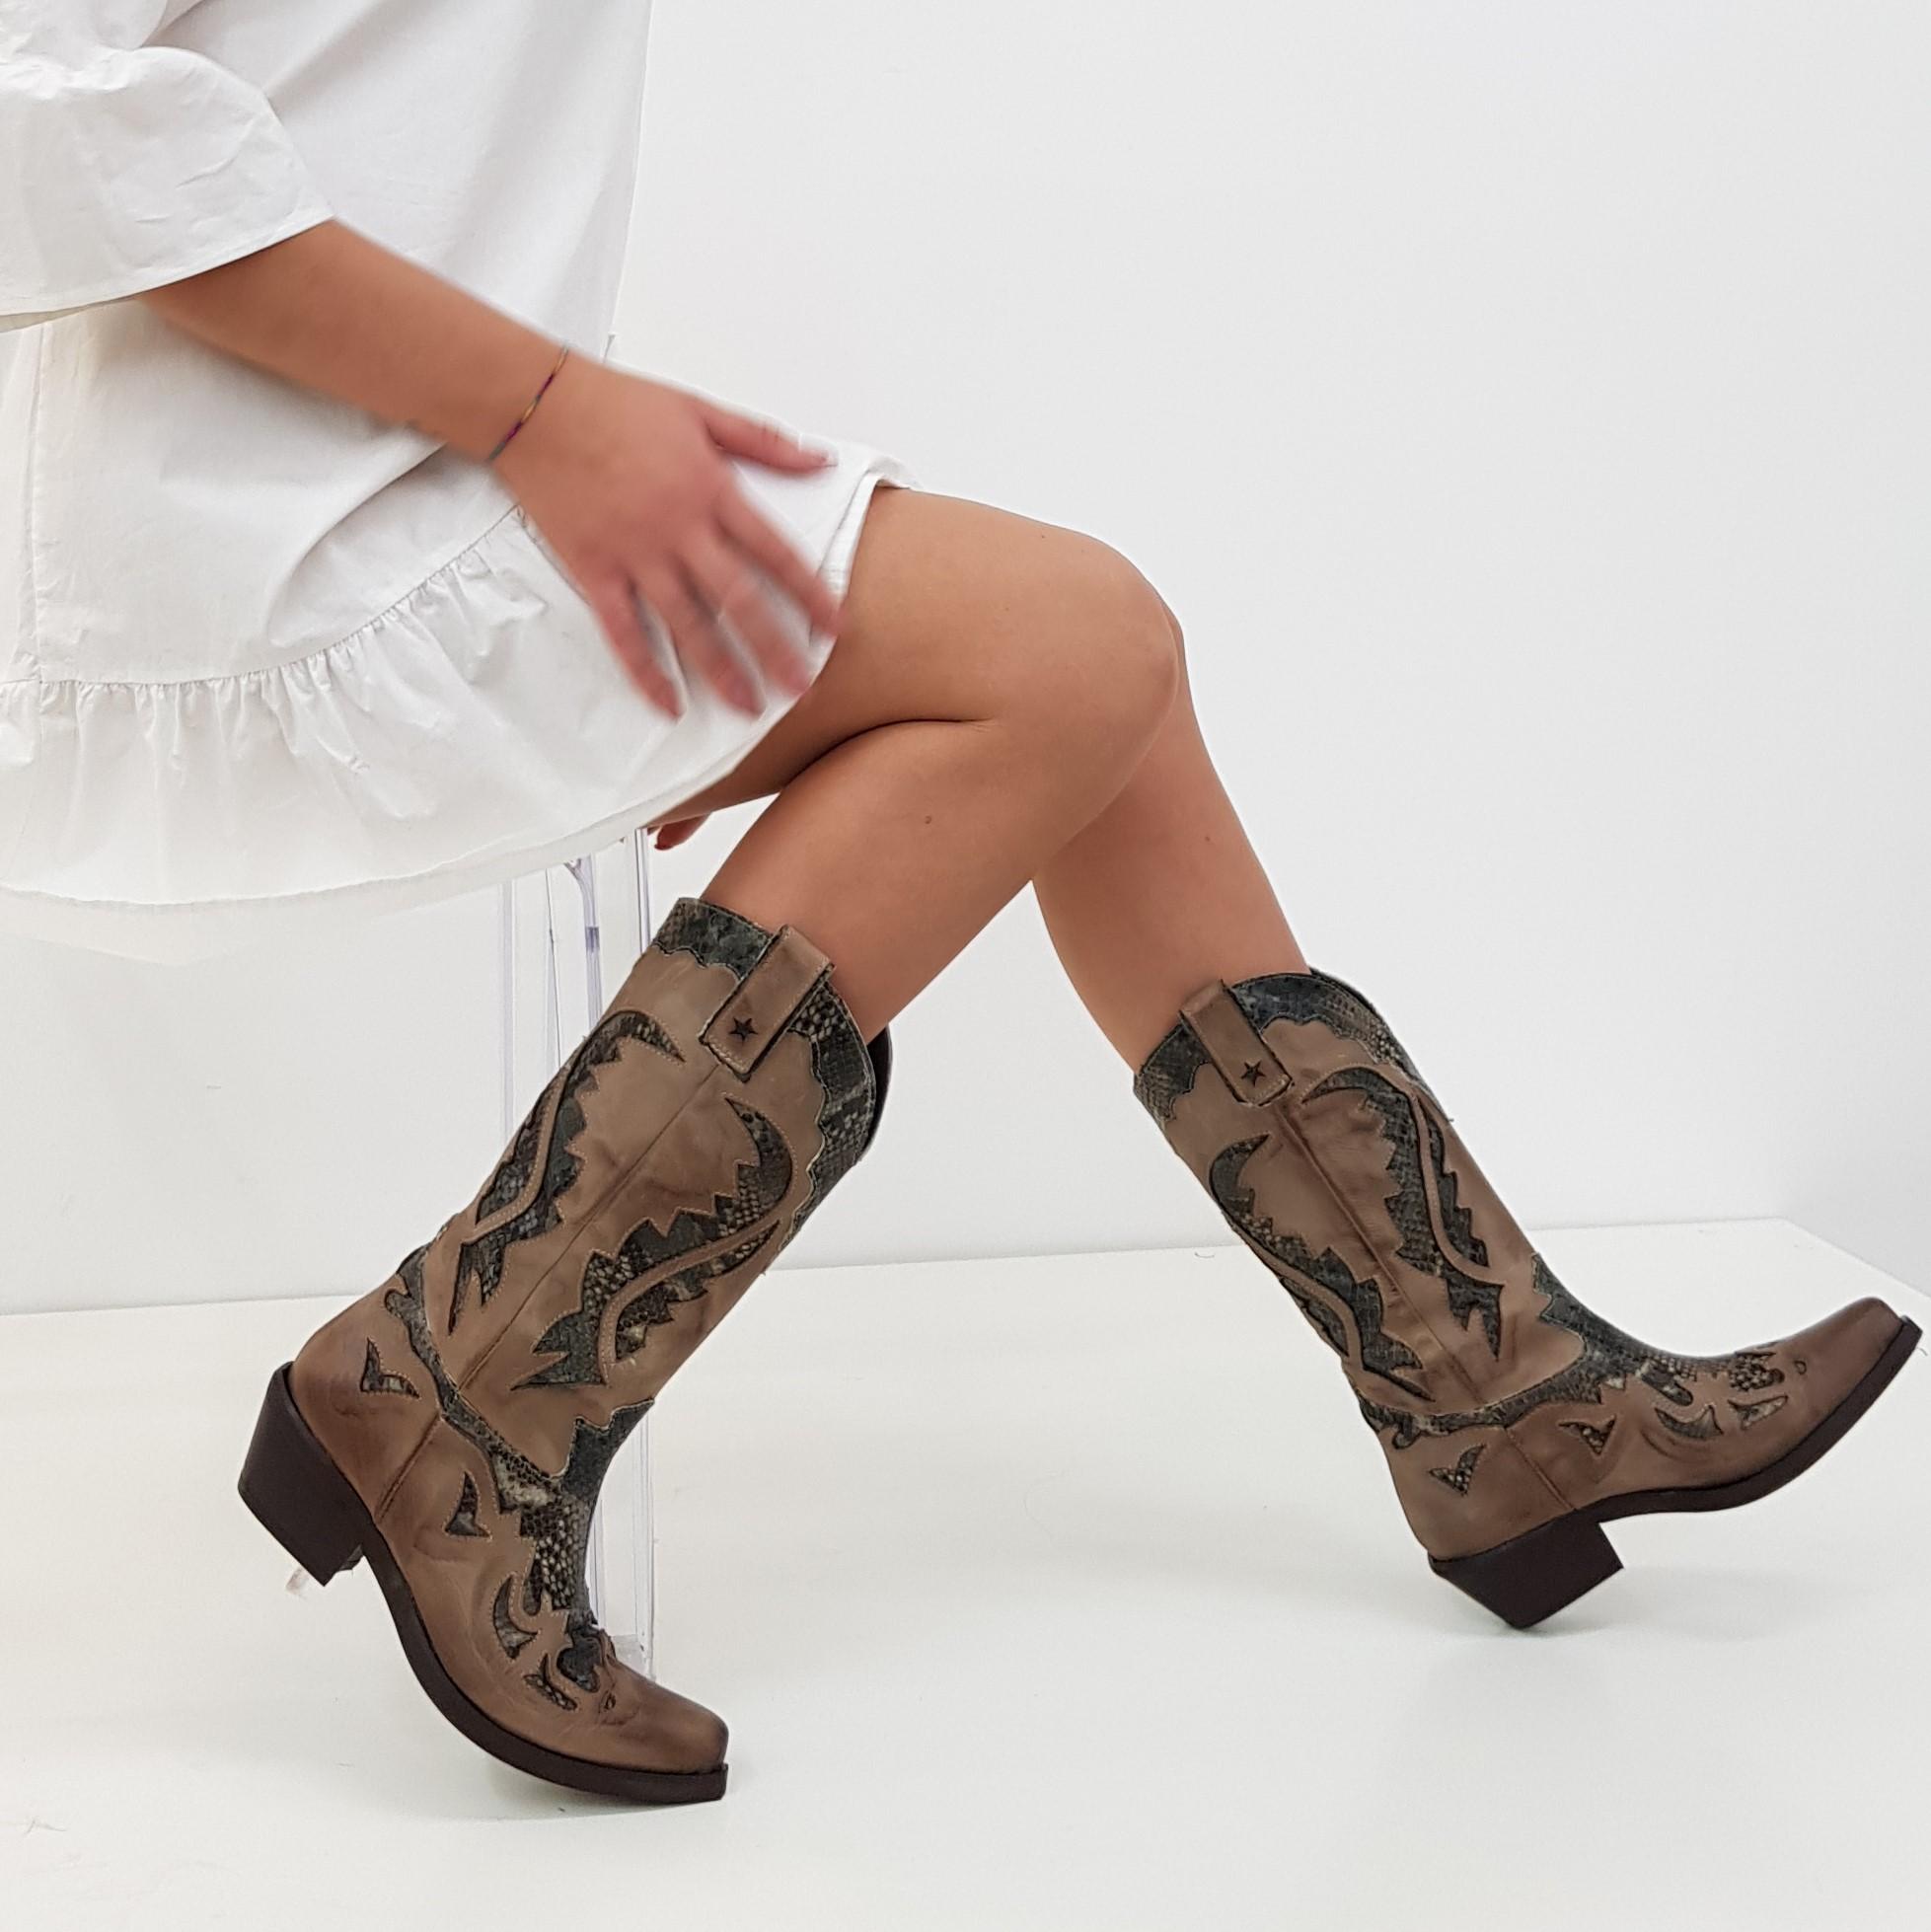 Stivali nabuk taupe e anaconda oldwest1 - Lia diva scarpe ...